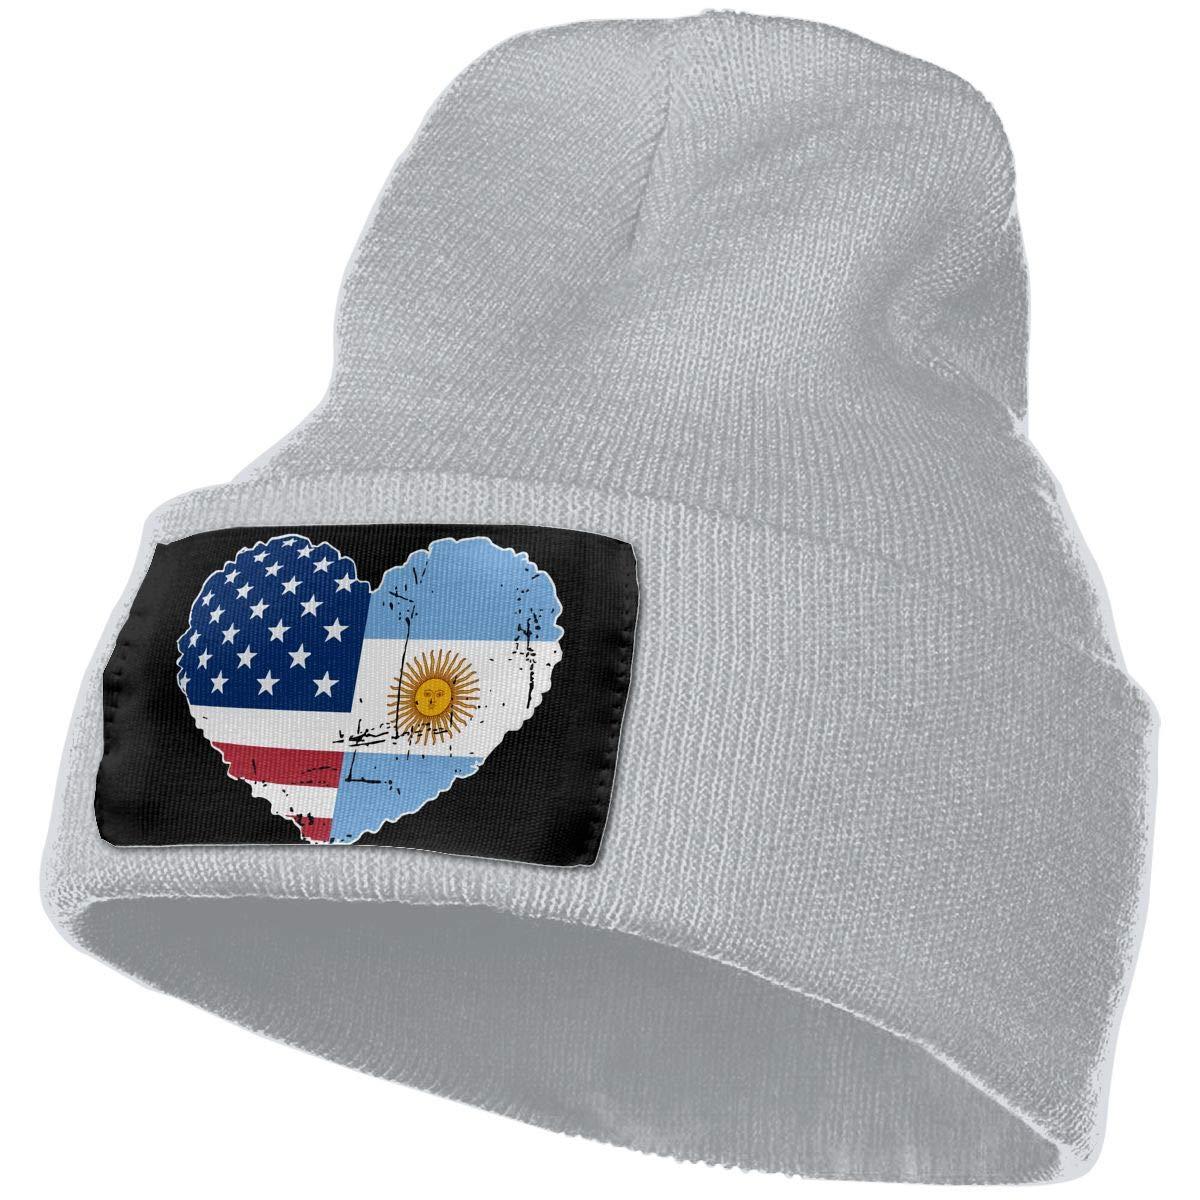 Custom Beanie for Men /& Women BMX Embroidery Acrylic Skull Cap Hat